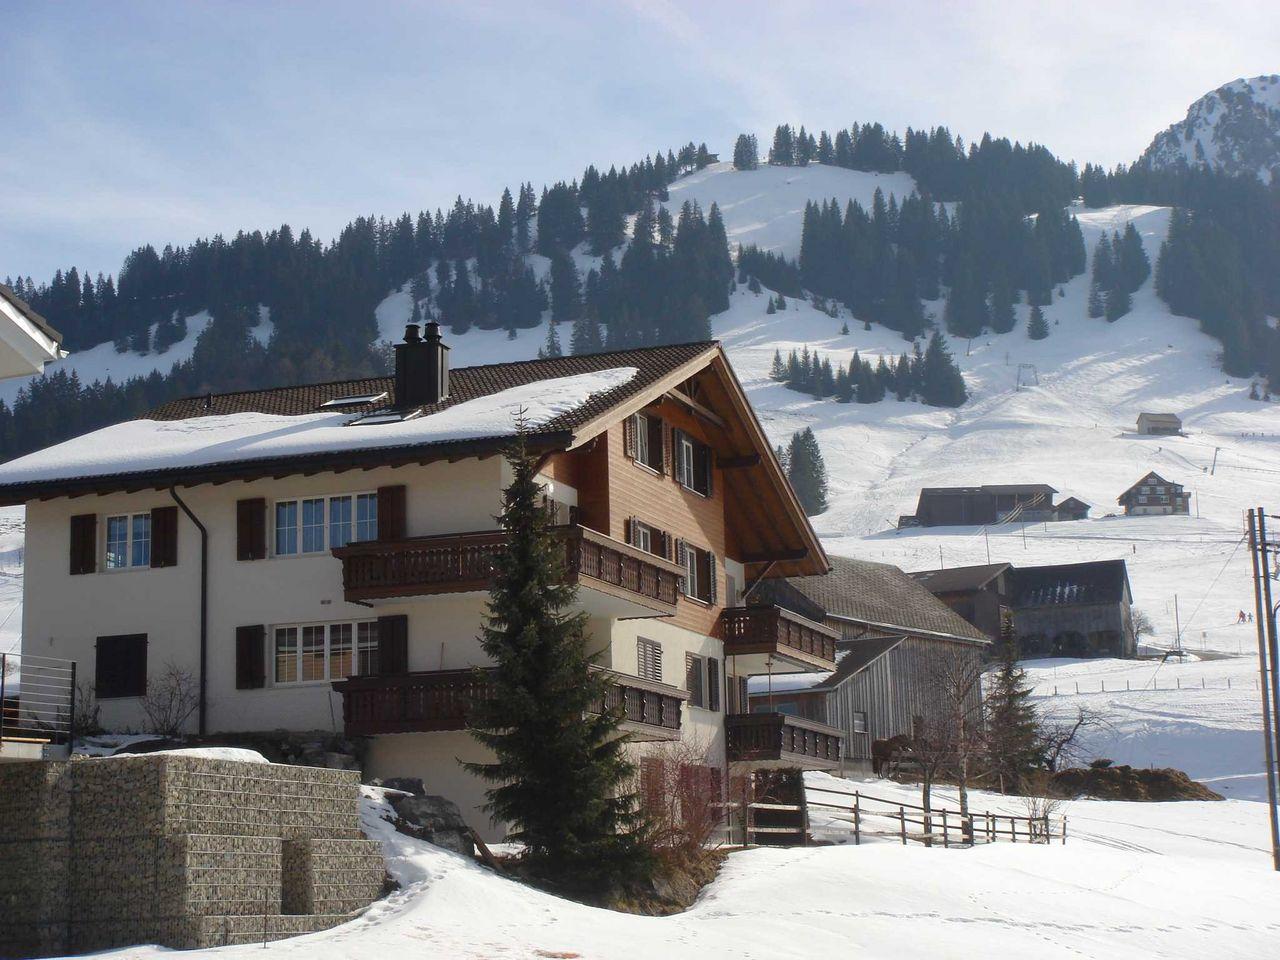 Chalet Moos, Hubli - Oberiberg, Ybrig